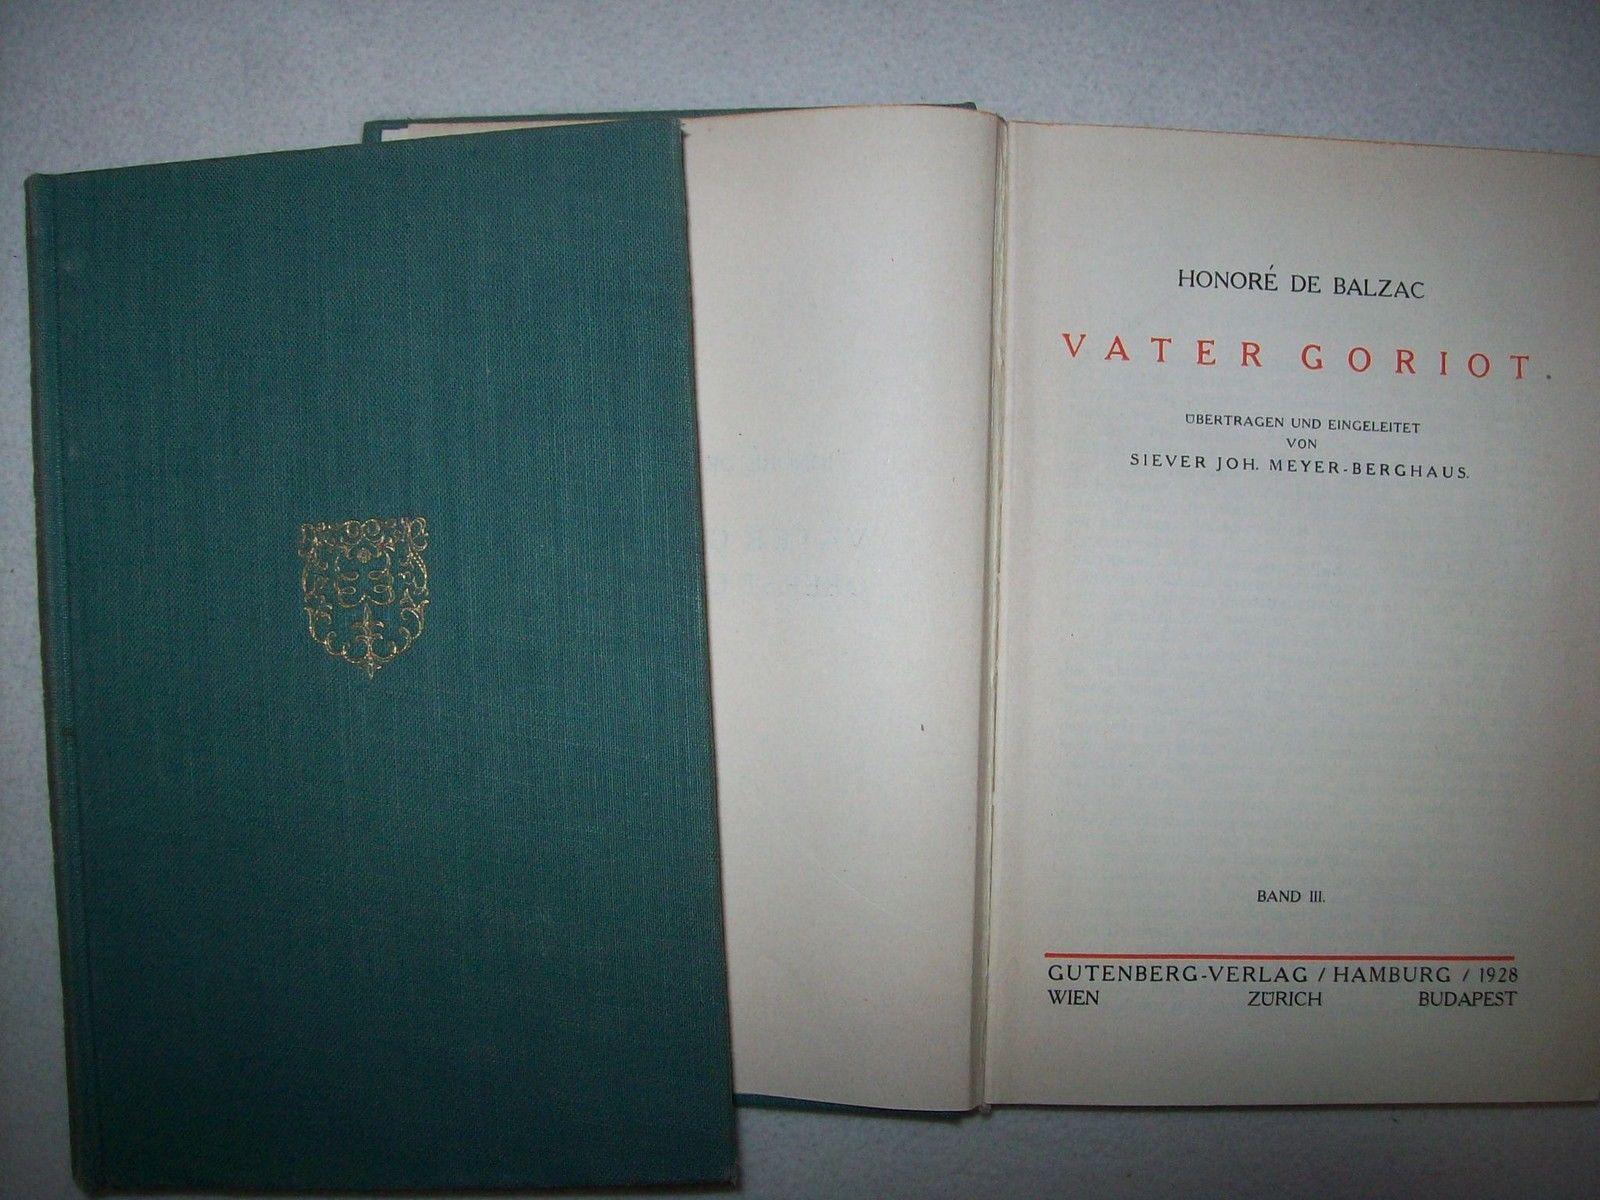 """2 Bücher von Honoré de Balzac"""